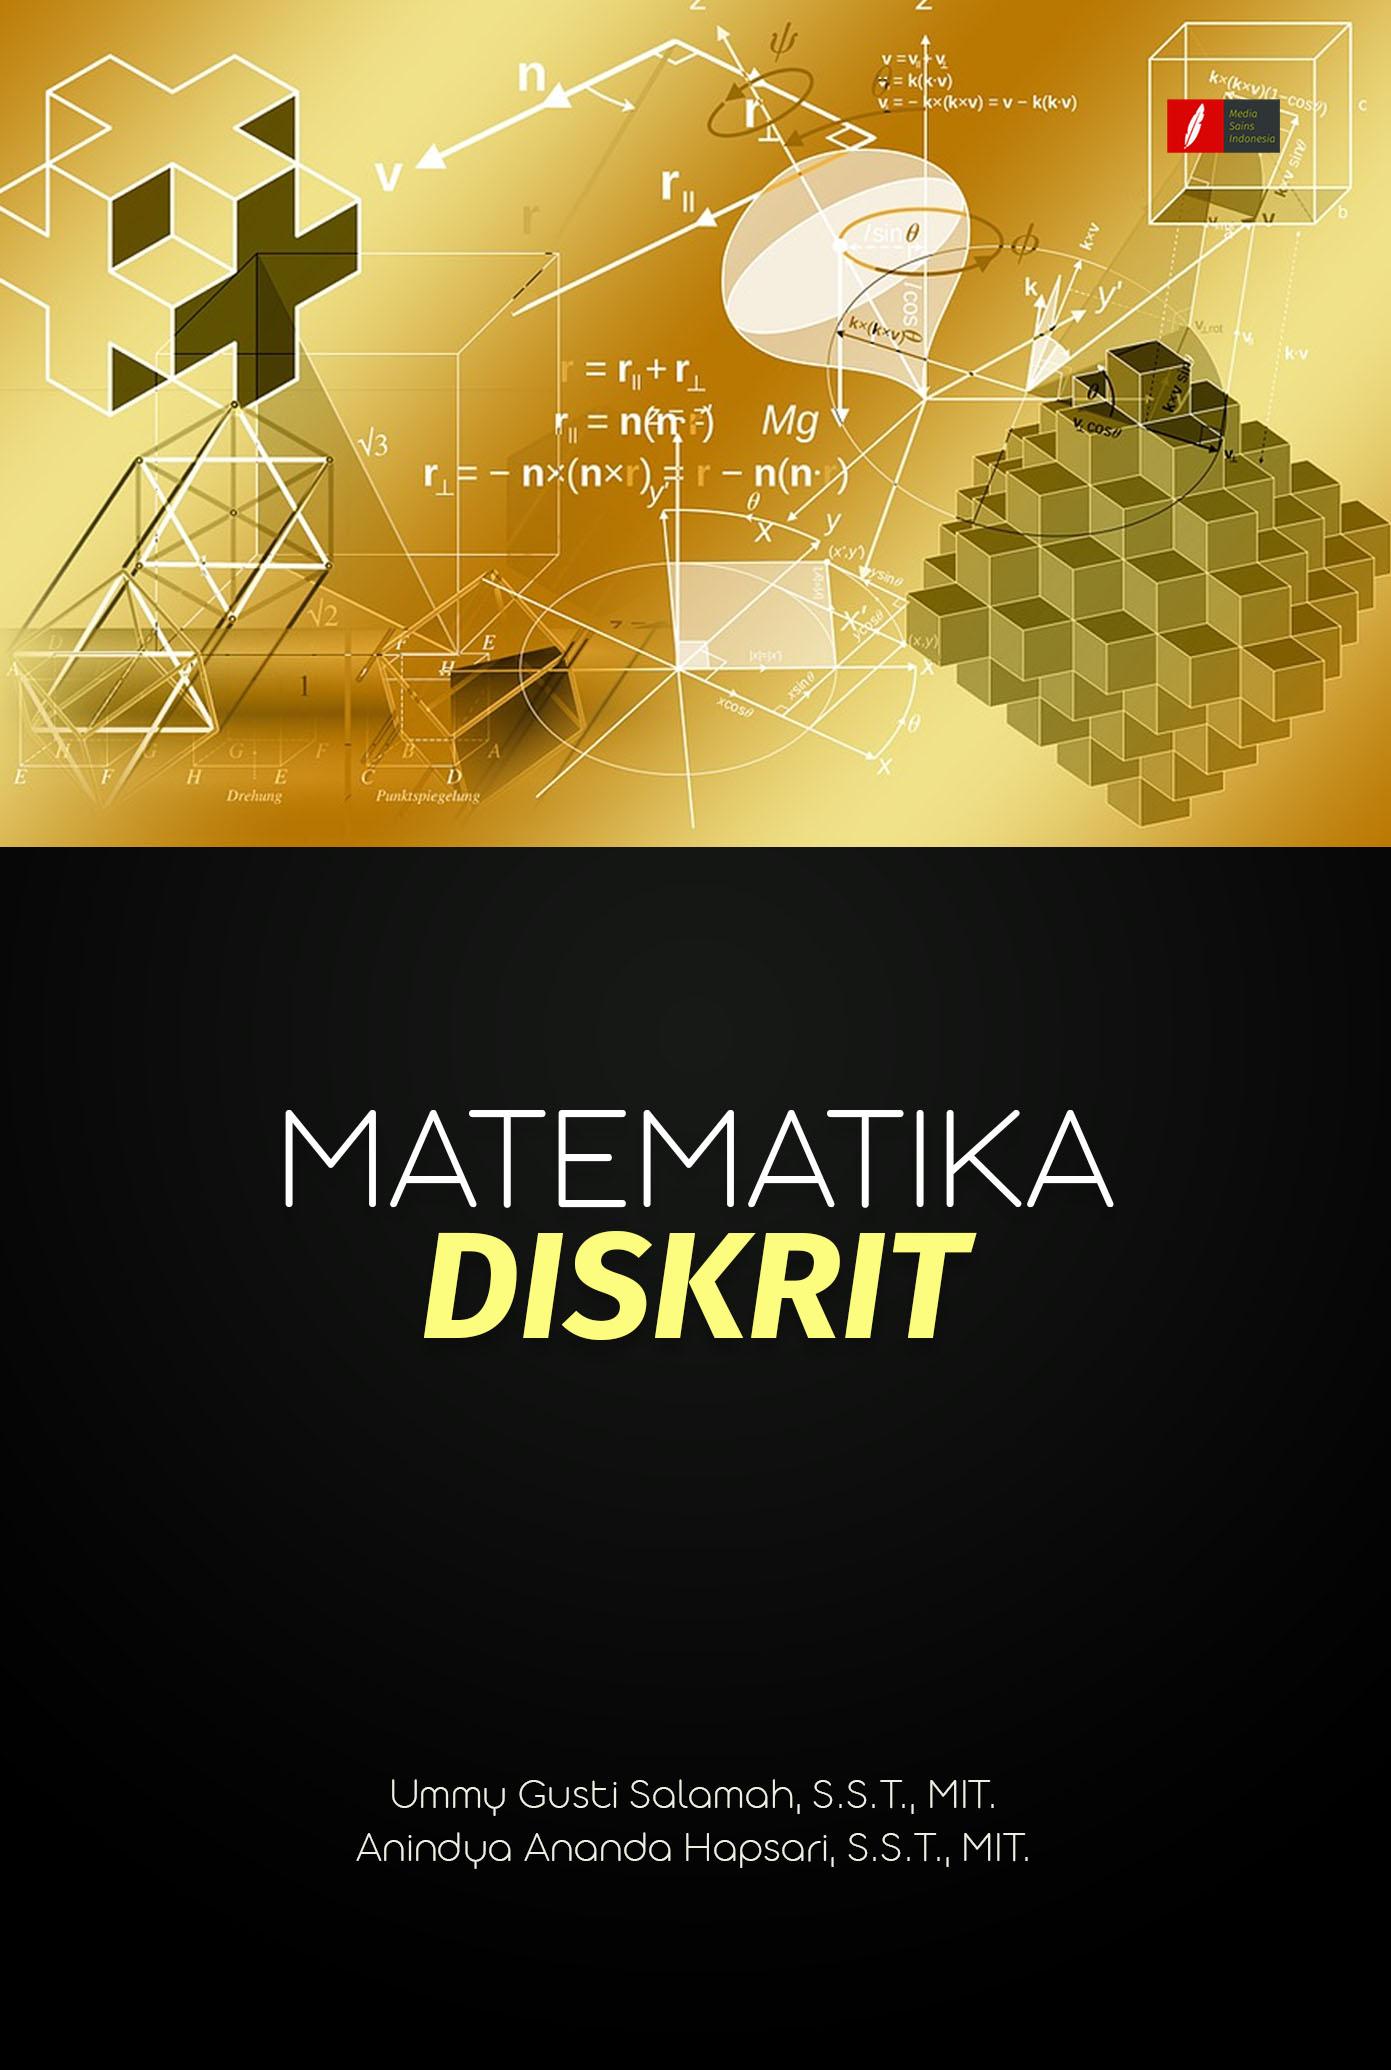 Matematika diskrit [sumber elektronis]